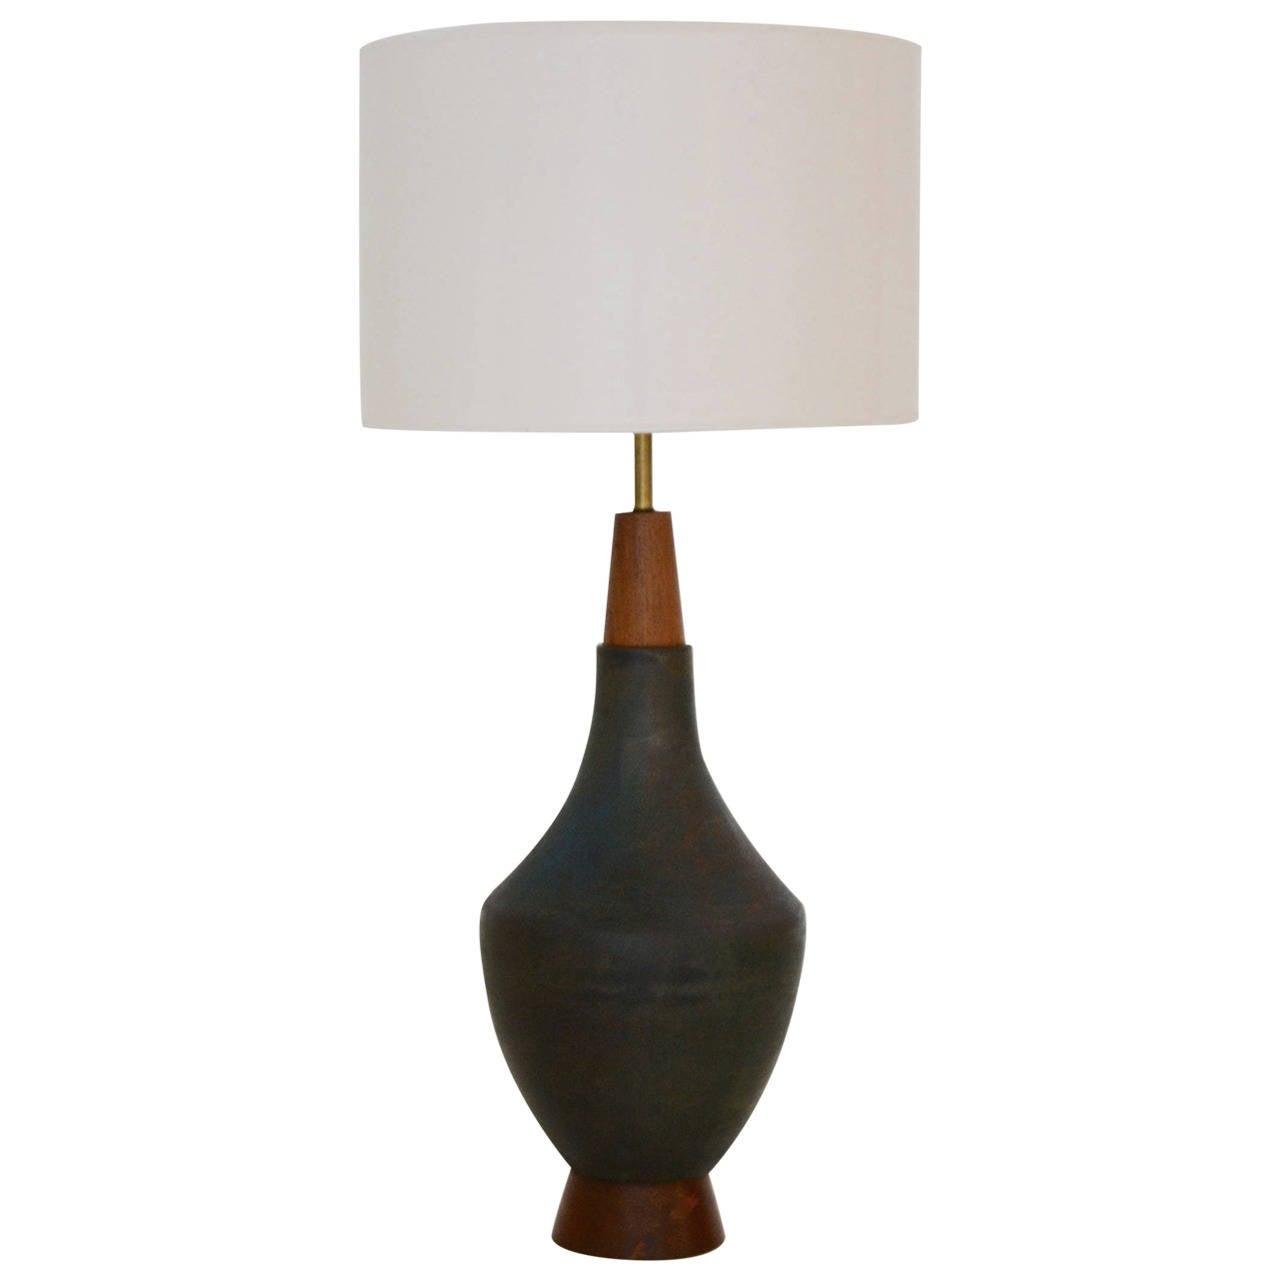 mid century modern ceramic table lamp at 1stdibs. Black Bedroom Furniture Sets. Home Design Ideas